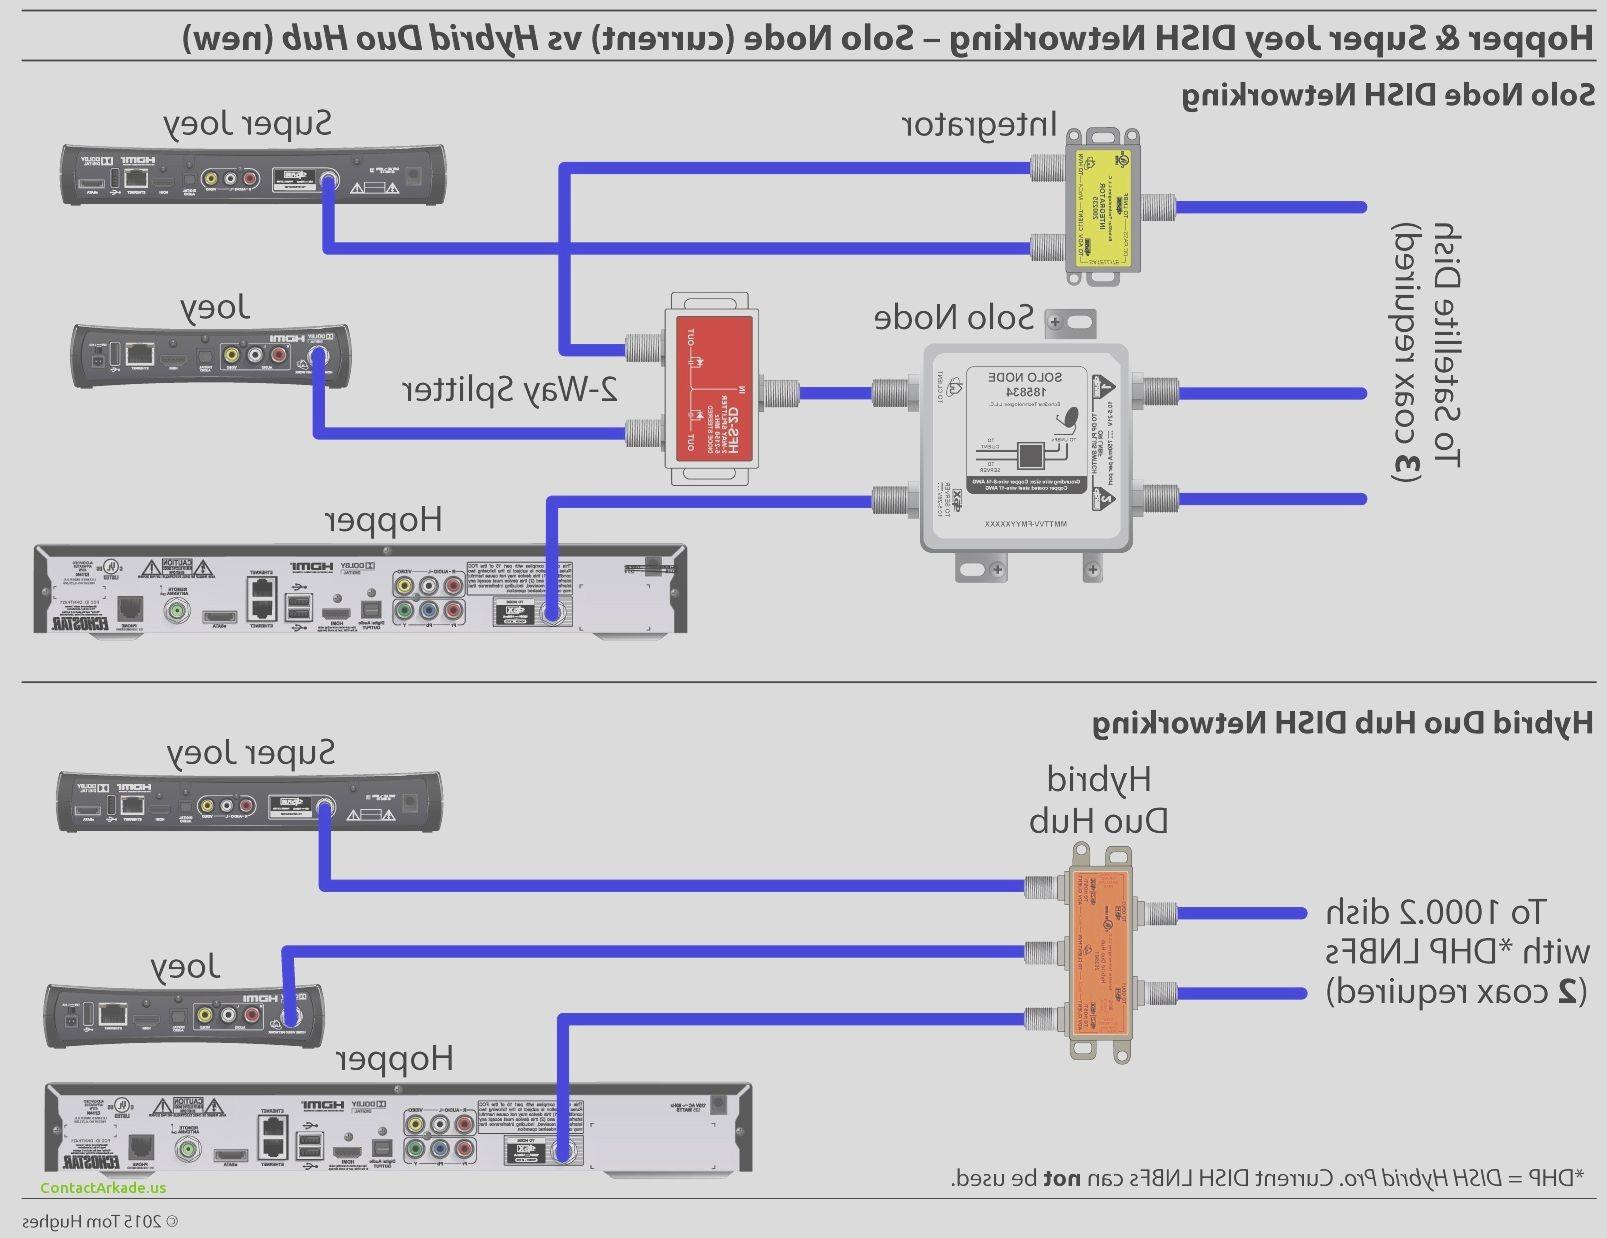 Dish Network Wiring Diagram Fresh Image Super Joey Wiring Diagram Hopper Dish Integrator to